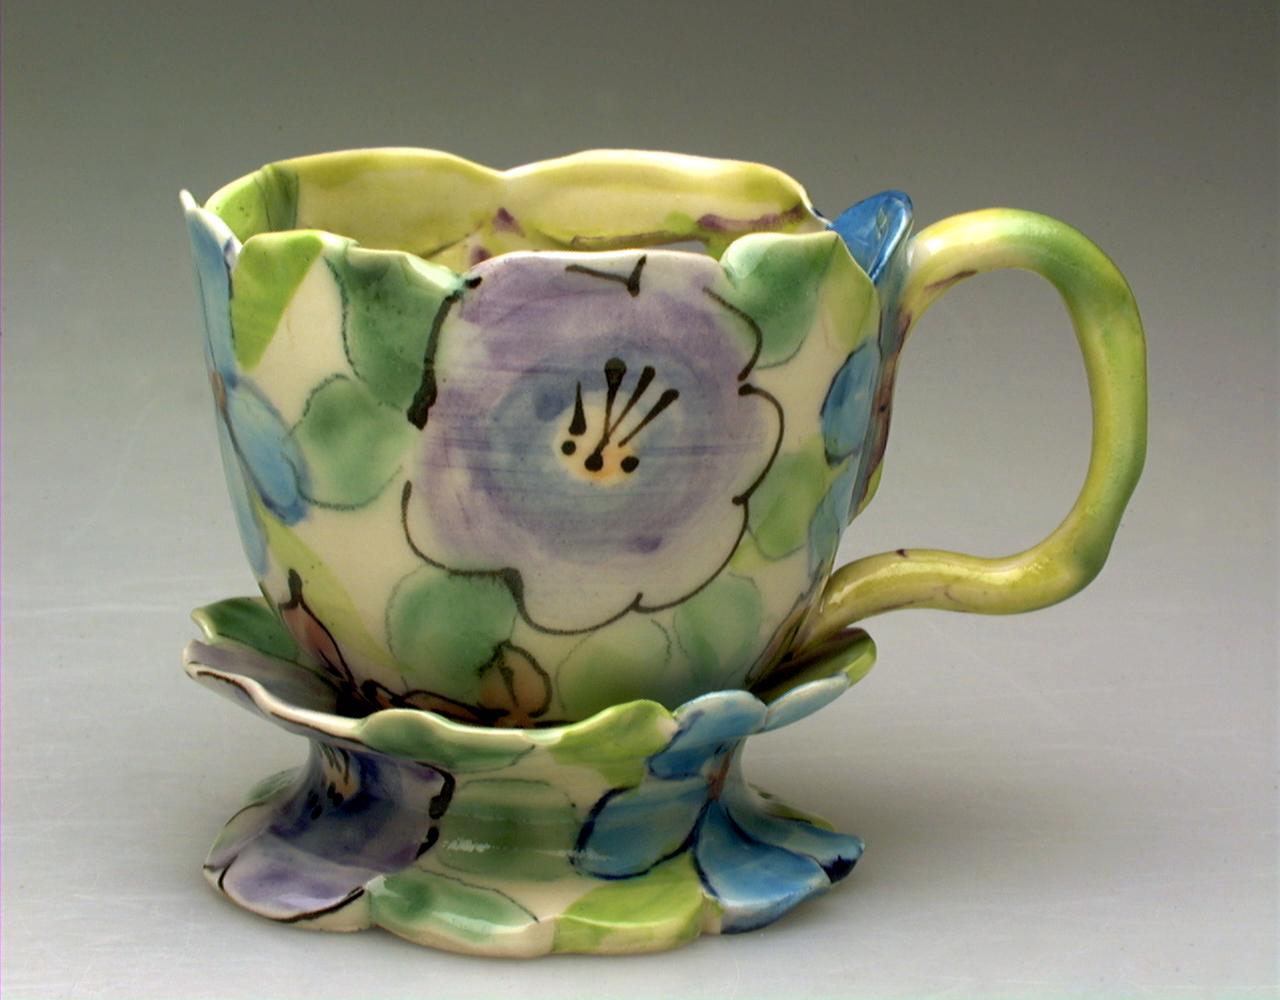 cup - Plum cup saucer015.jpg